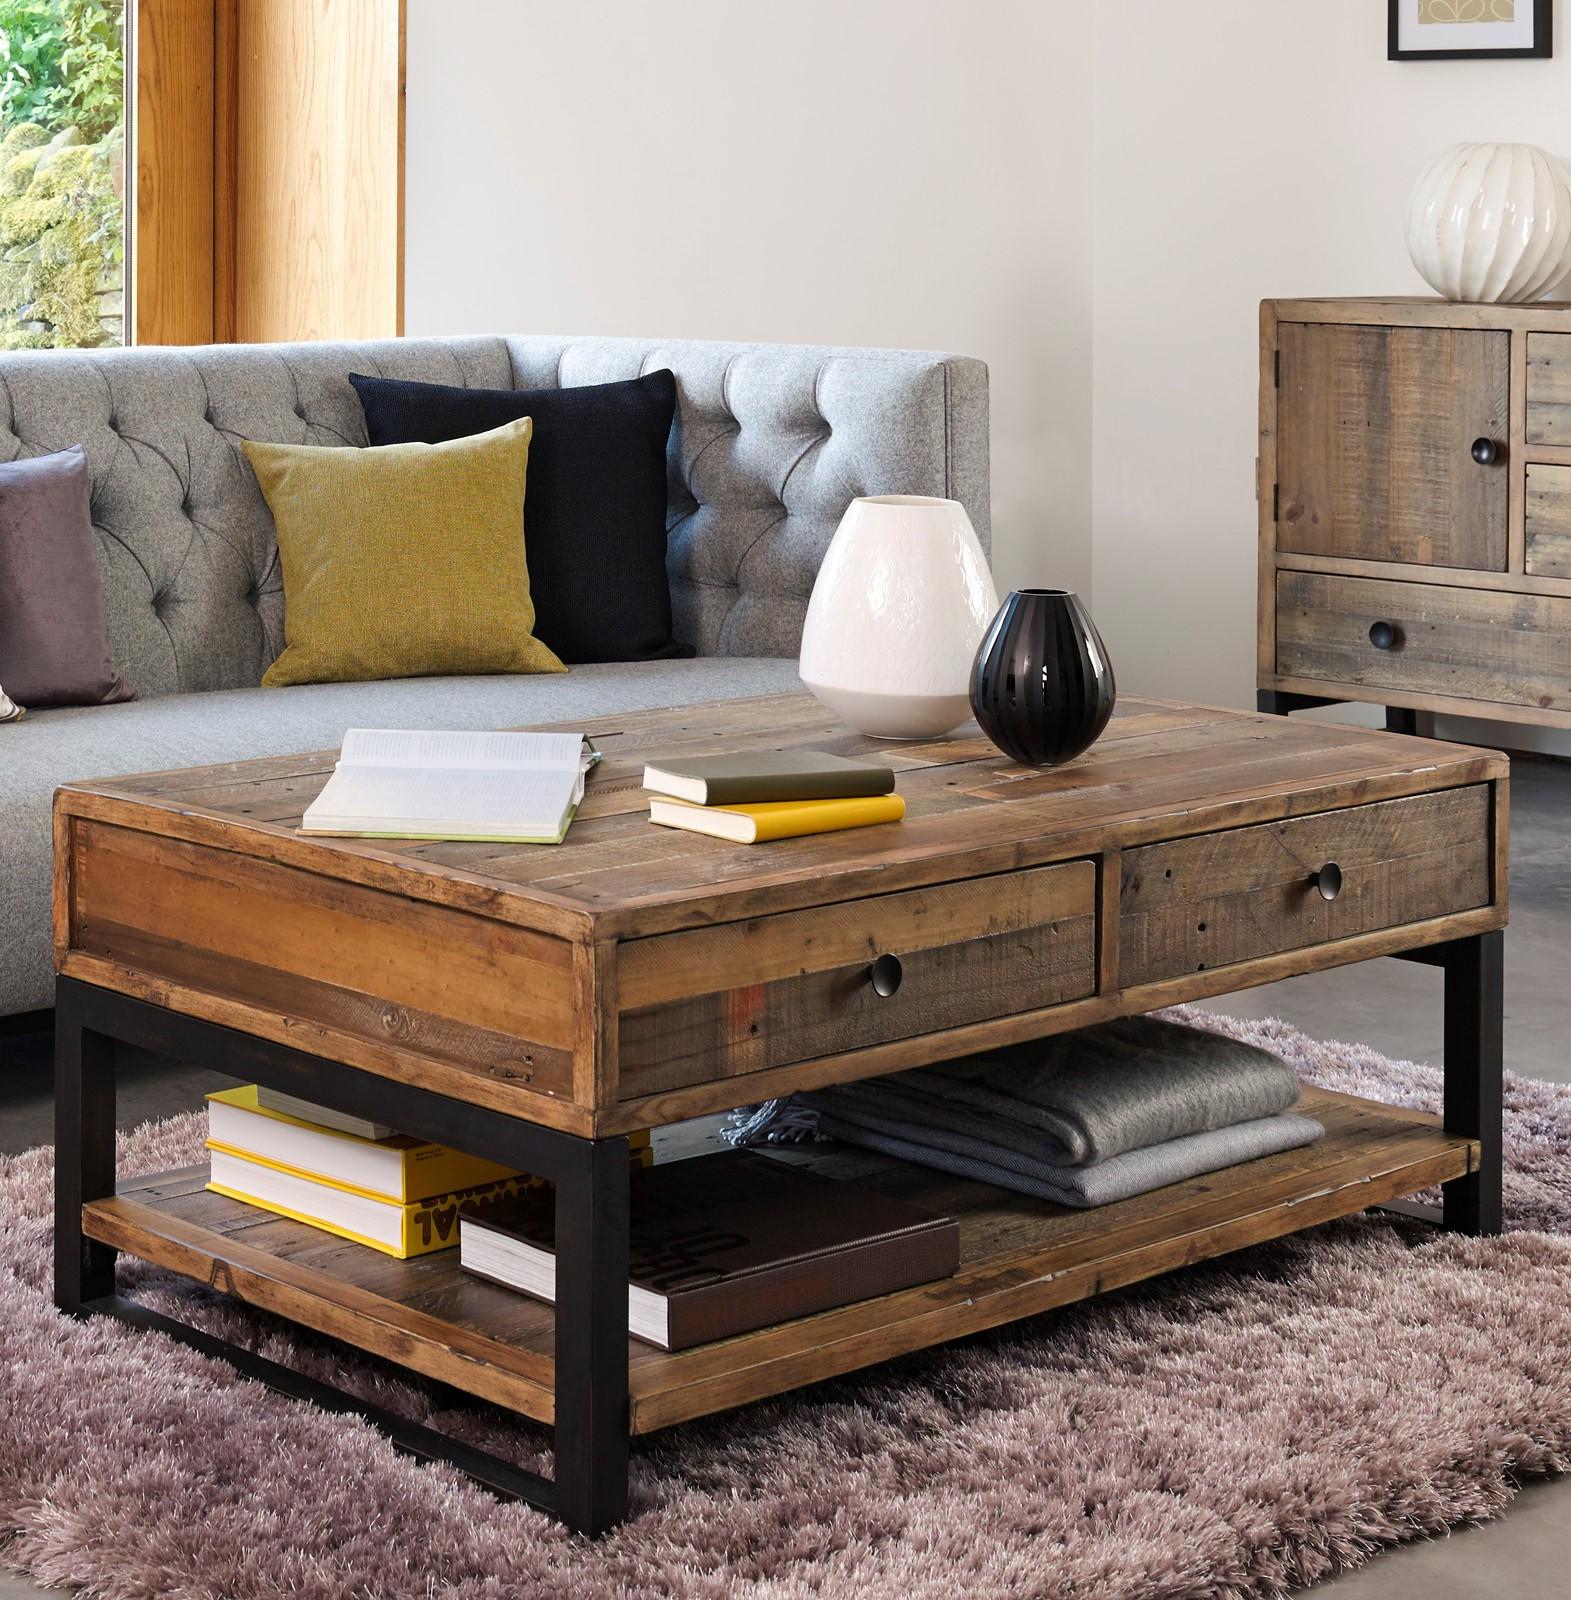 table basse bois recycle double plateau